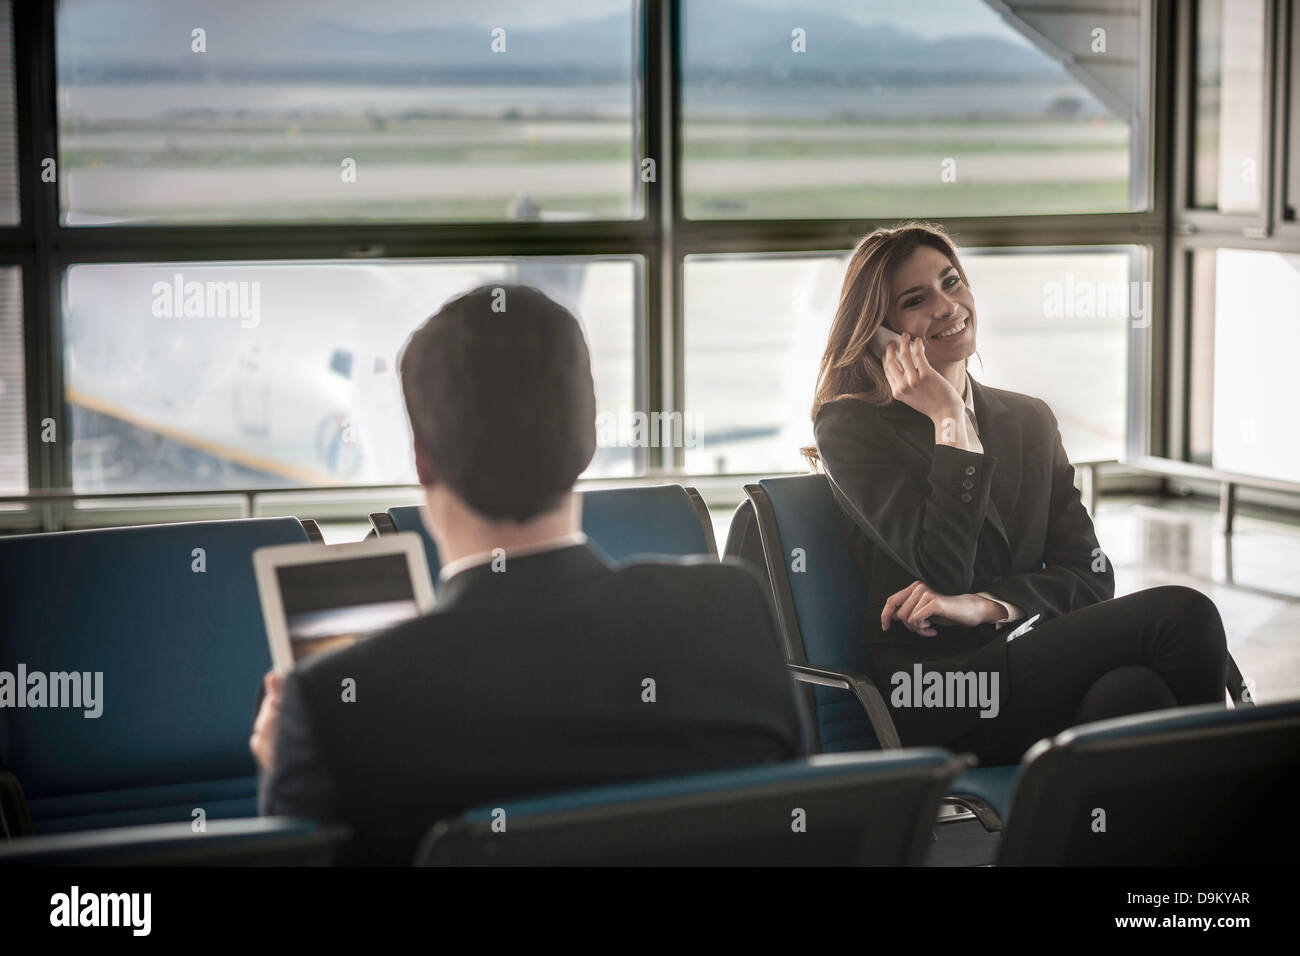 Businessman using digital tablet, businesswoman on mobile phone - Stock Image